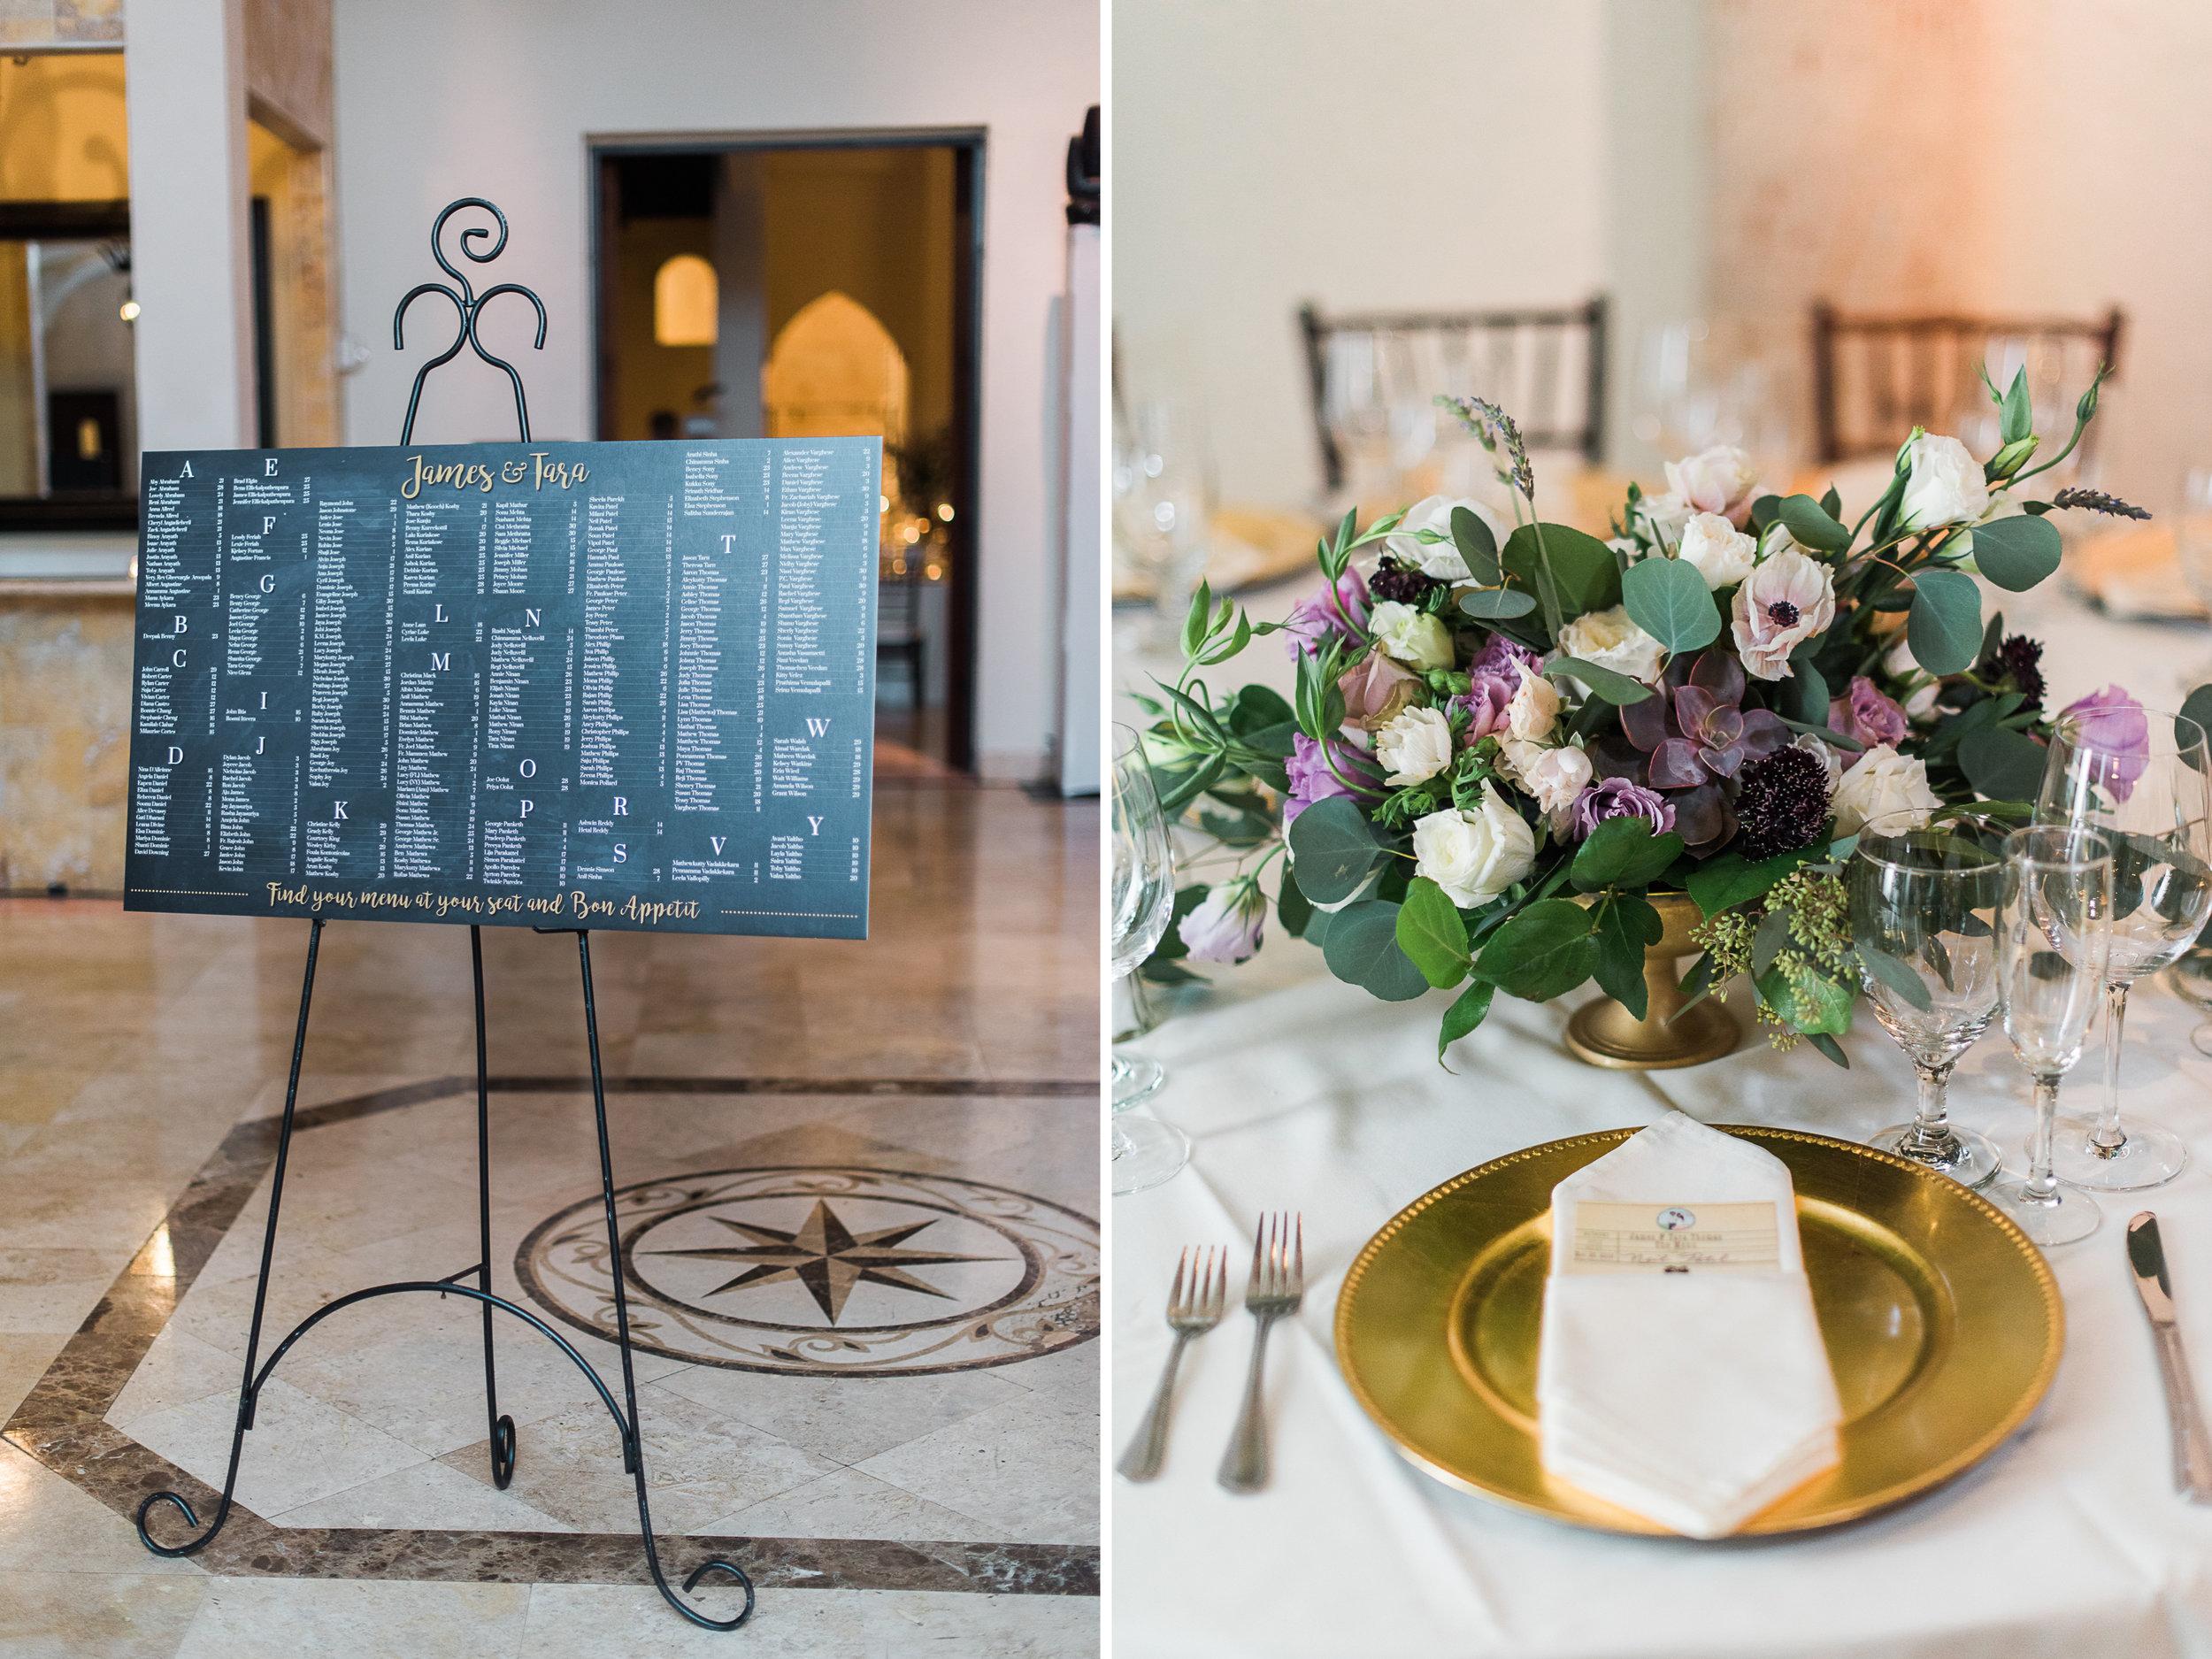 Fine-Art-Film-Houston-Wedding-Photographer-Best-Top-Luxury-Texas-Austin-Dallas-Destination-Dana-Fernandez-Photography-The-Bell-Tower-on-34th-Indian-9-123.jpg